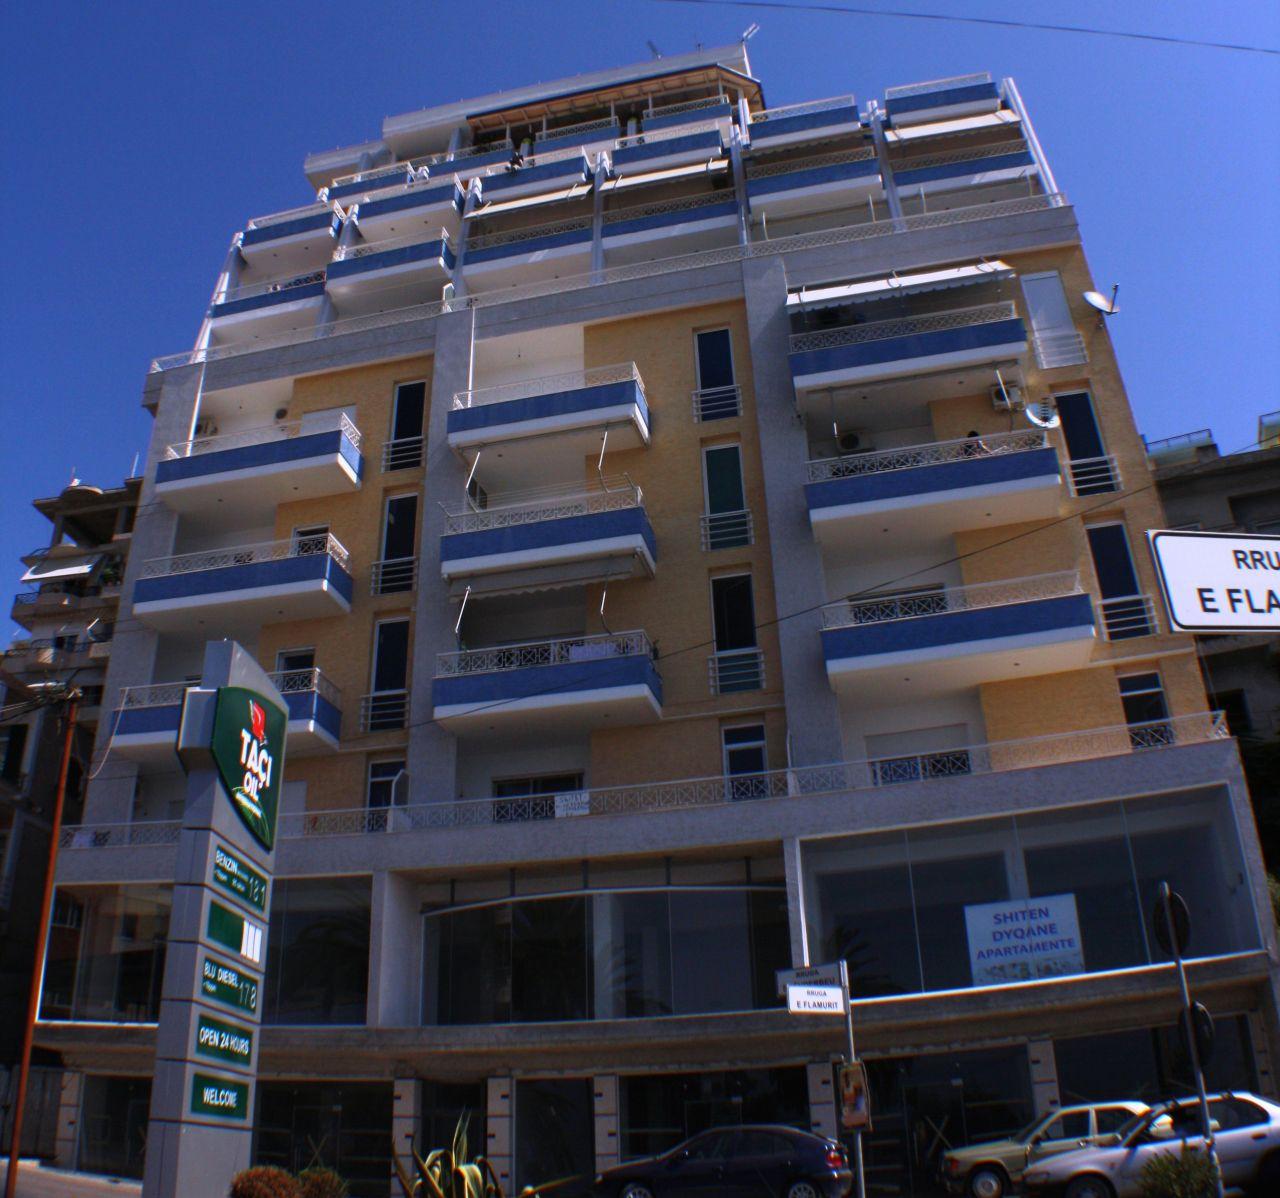 Albania Real Estate in Saranda for Sale. Apartment in Saranda City Center Next to Ionian Sea